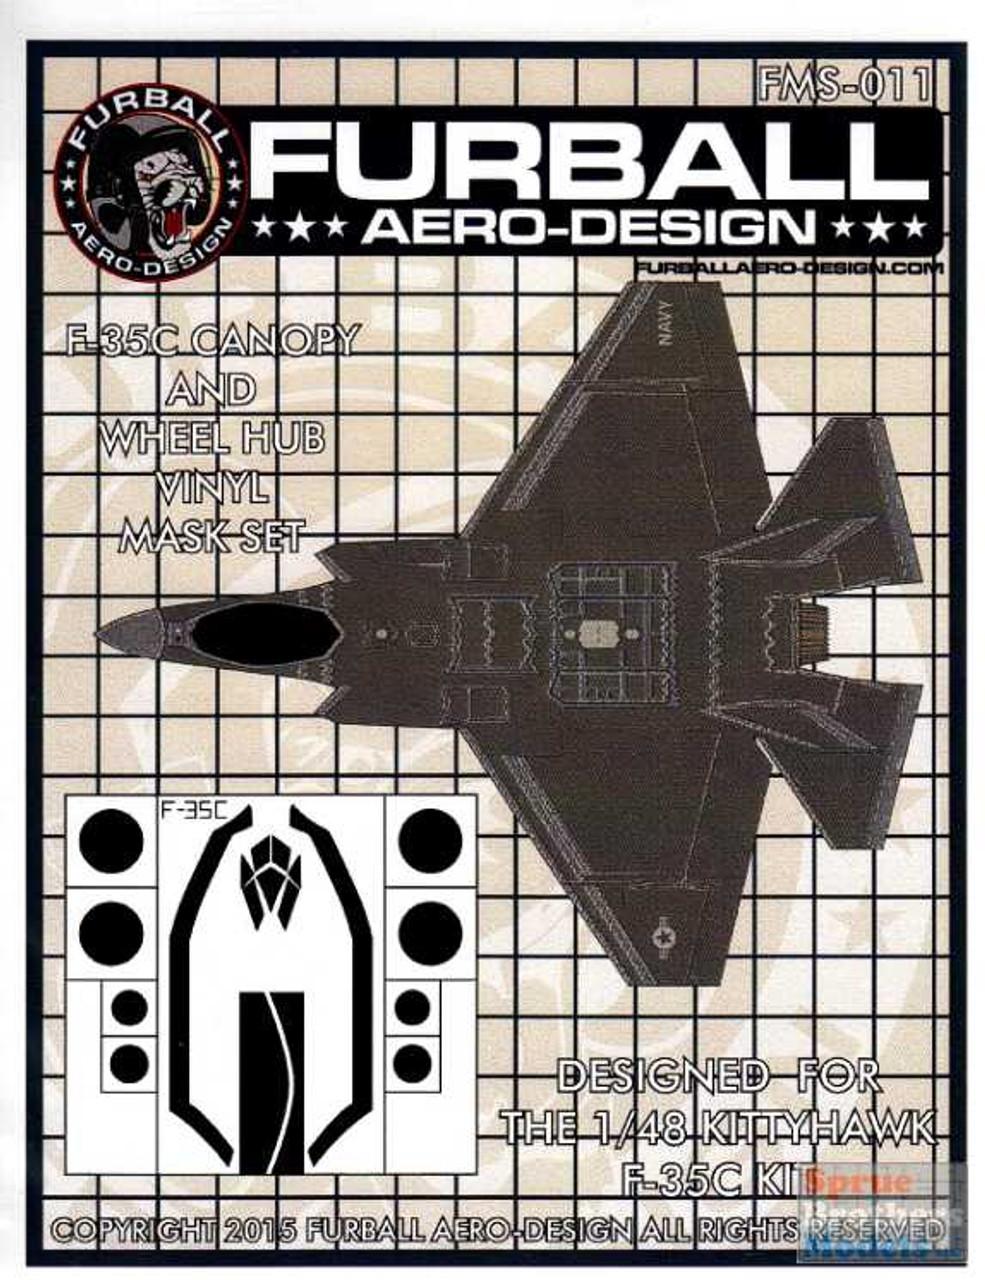 FURFMS011 1:48 Furball Aero Design Canopy & Wheel Hub Vinyl Mask Set for F-35C Lightning II (KTH kit)